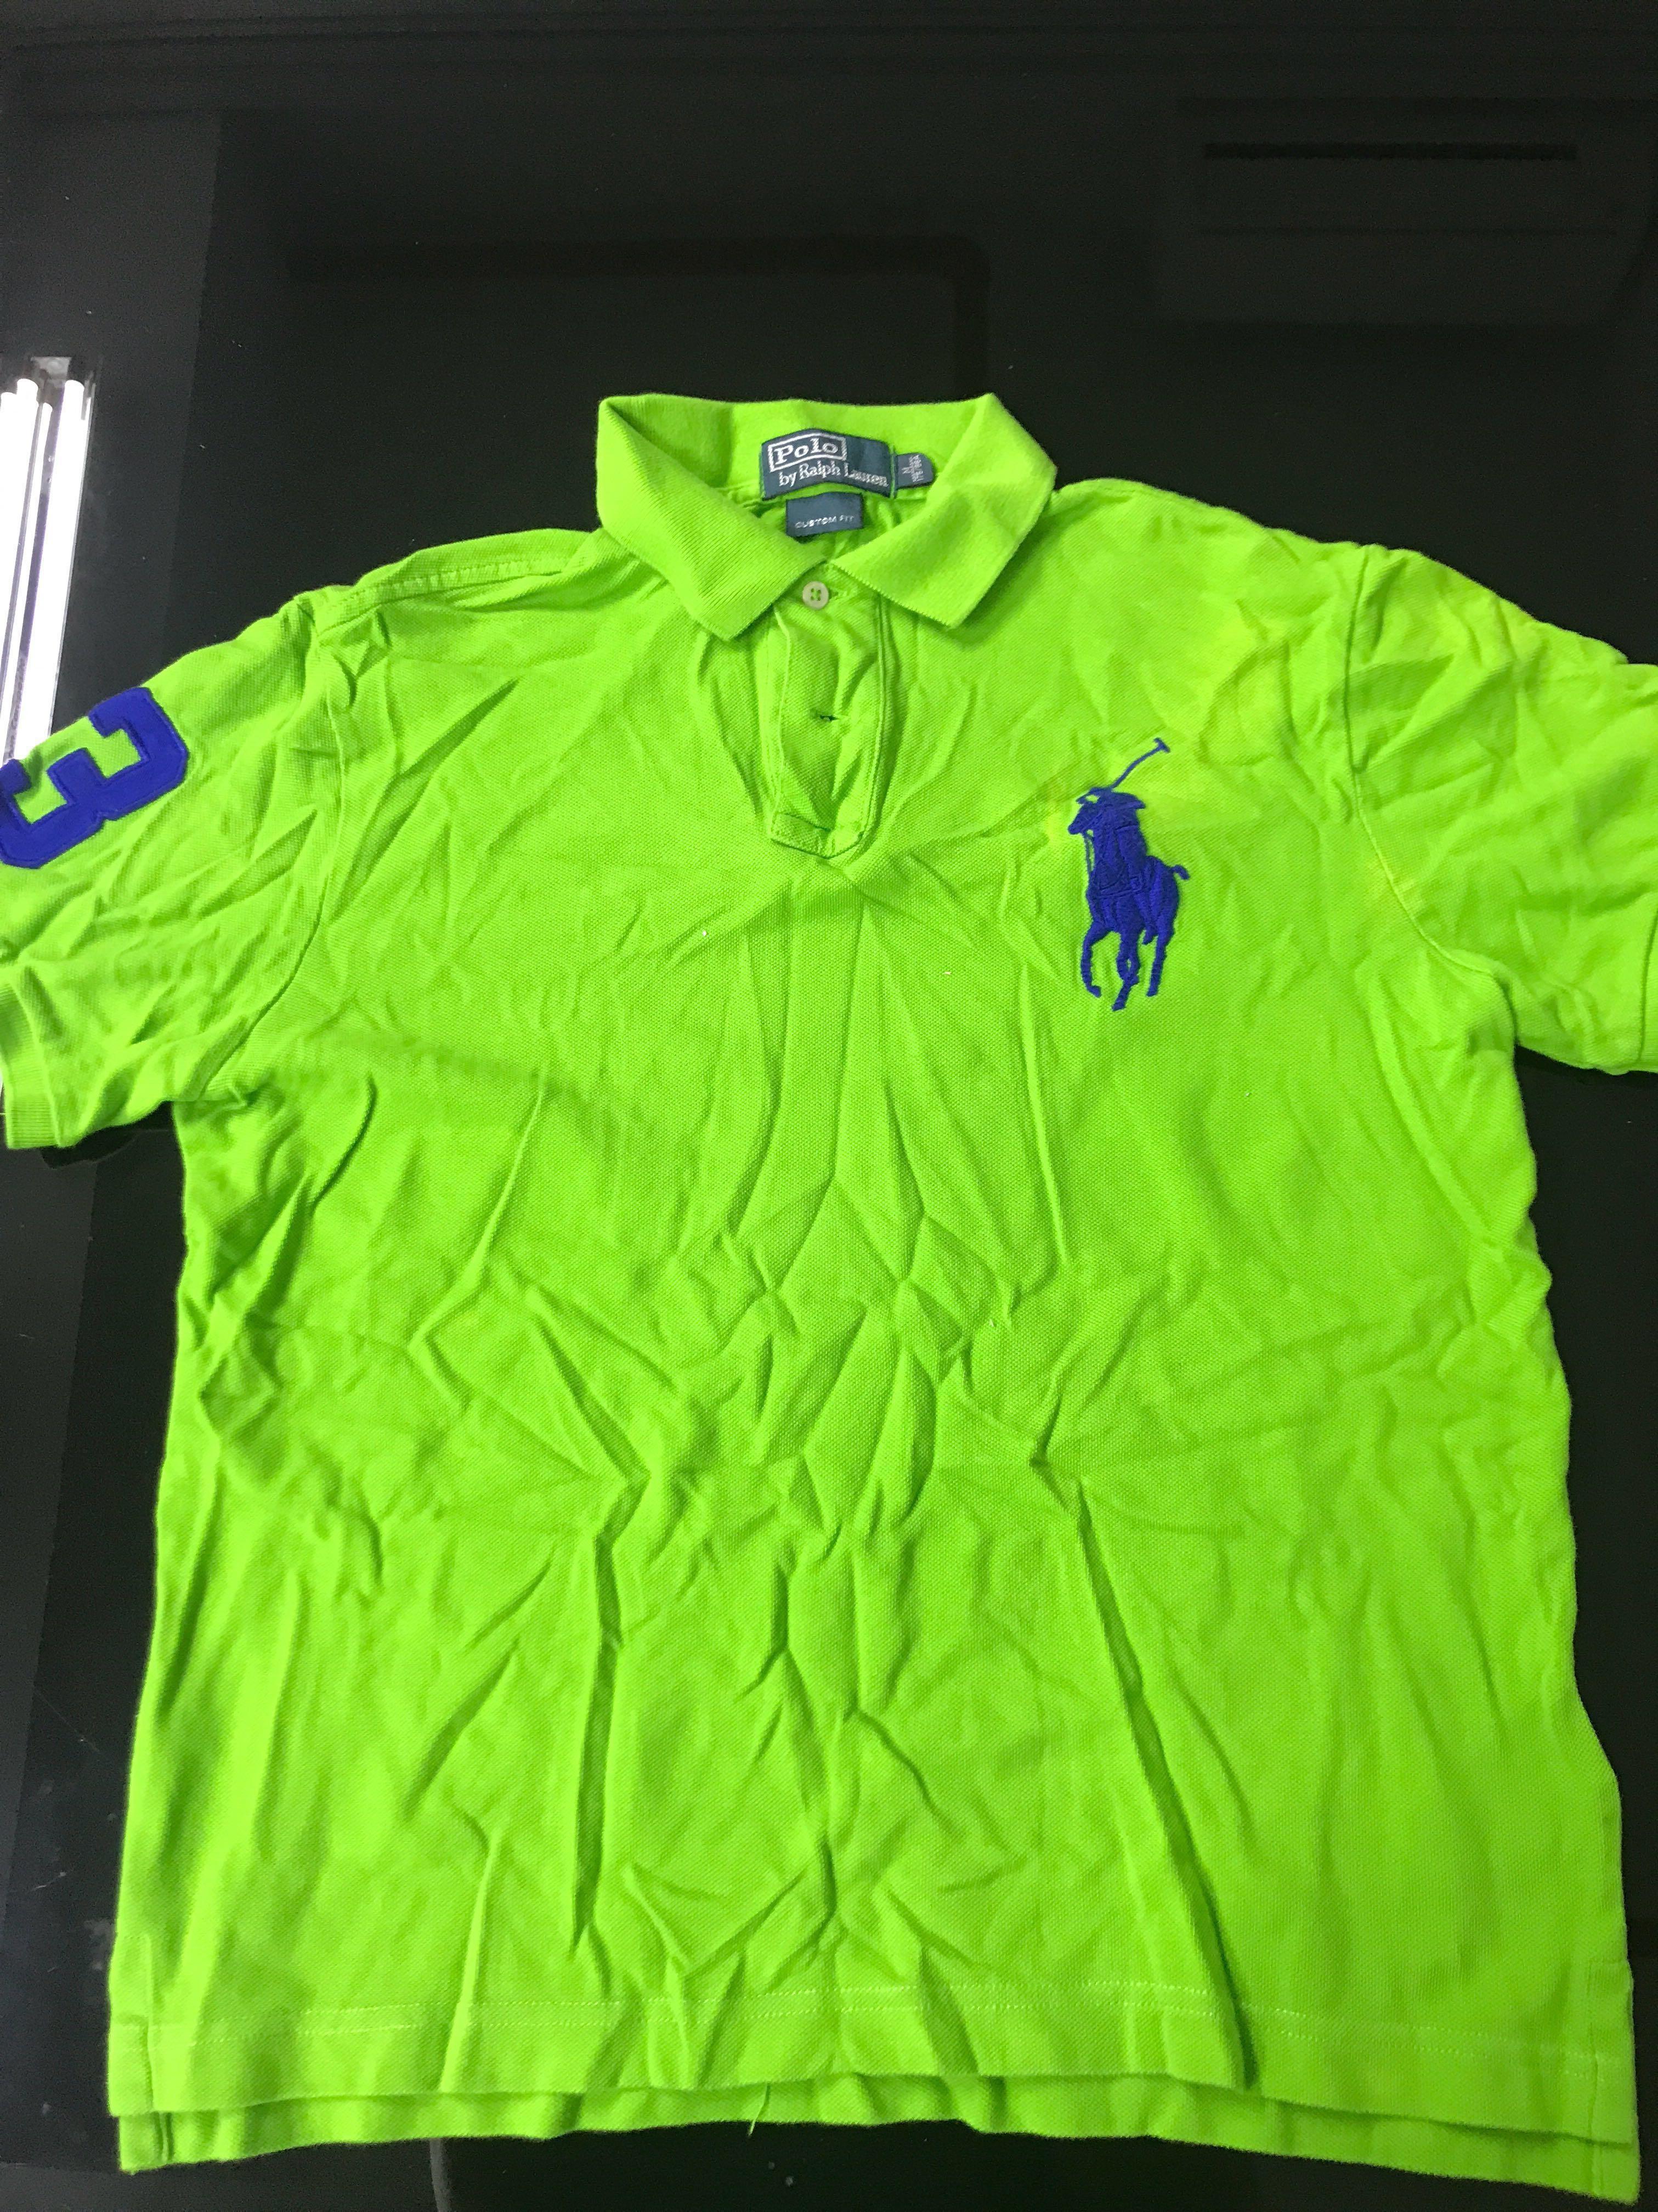 3a56aaeee Green Polo Ralph Lauren Polo Shirt